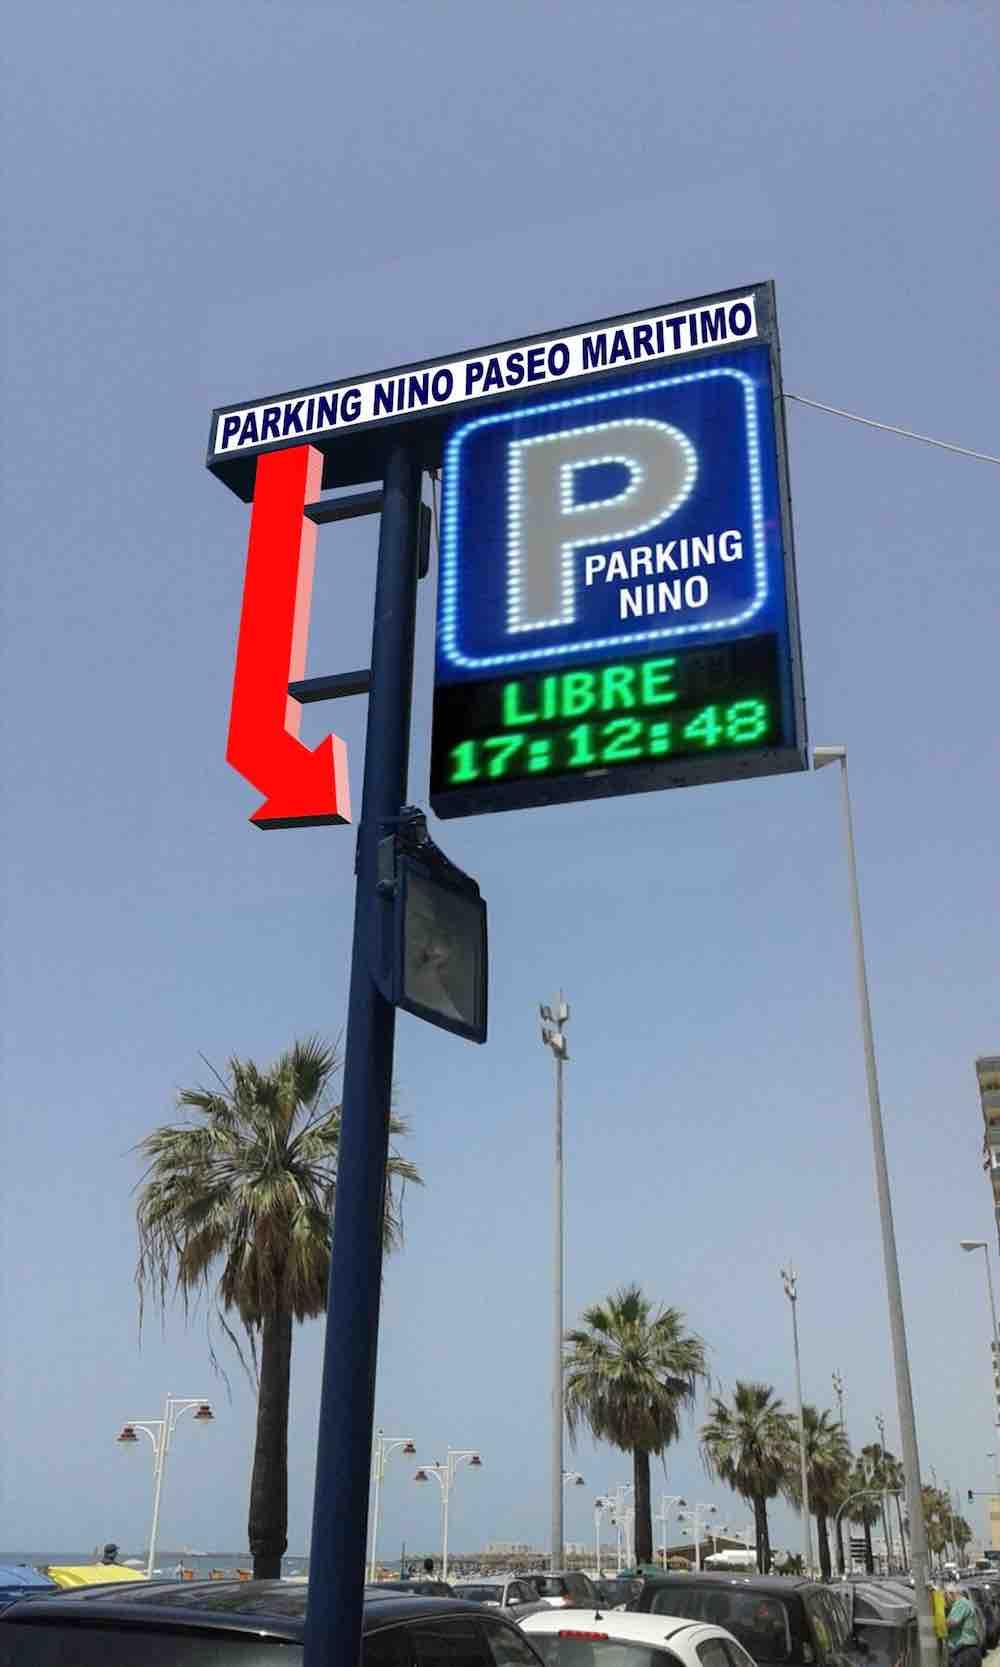 Parking Nino